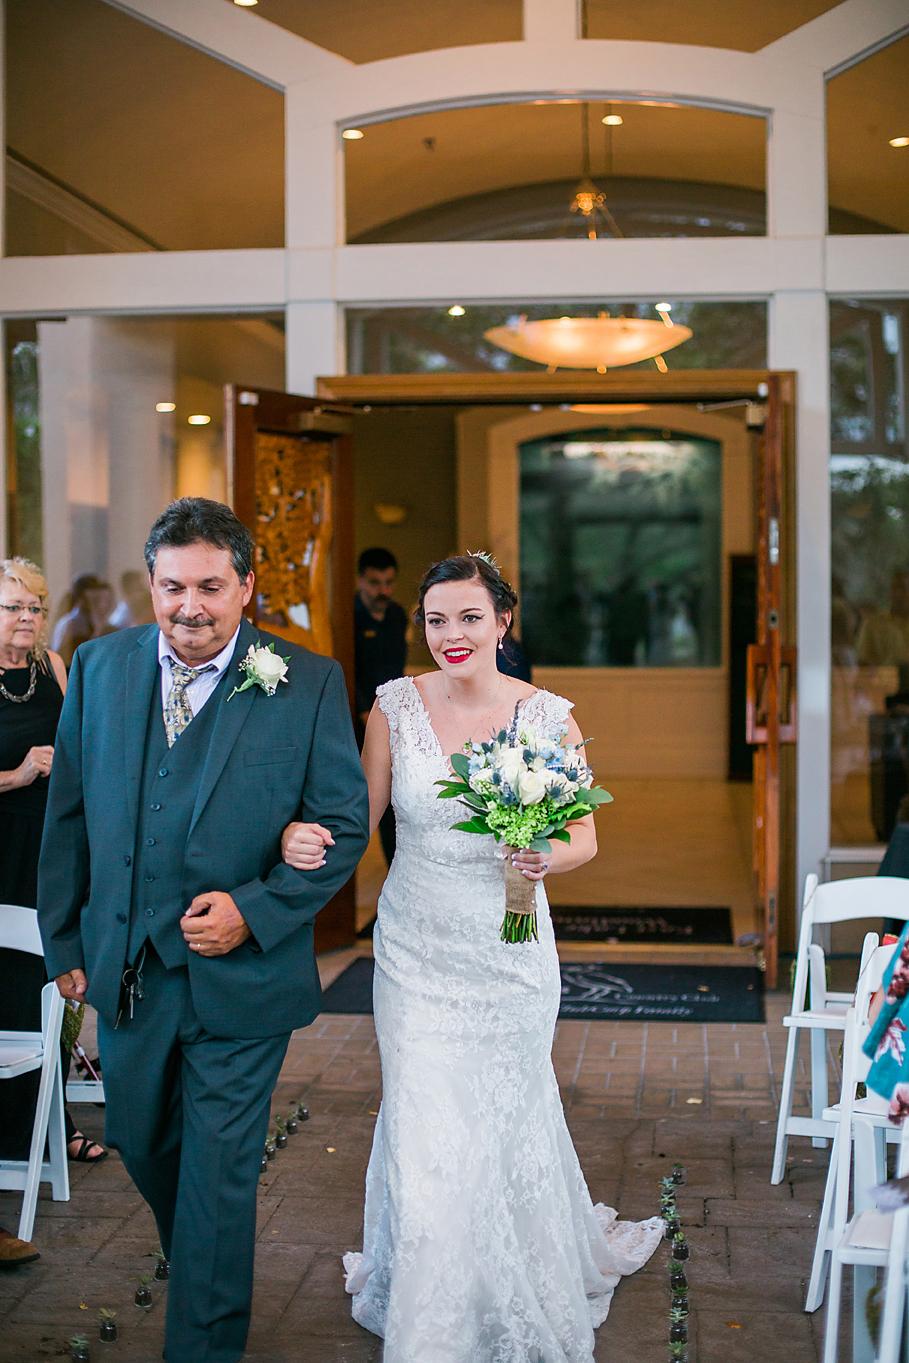 Kayla + Jesse - Tampa Wedding Photography - East Lake Woodland's Country Club Wedding Photographer - Emily & Co. Photography  (22).jpg